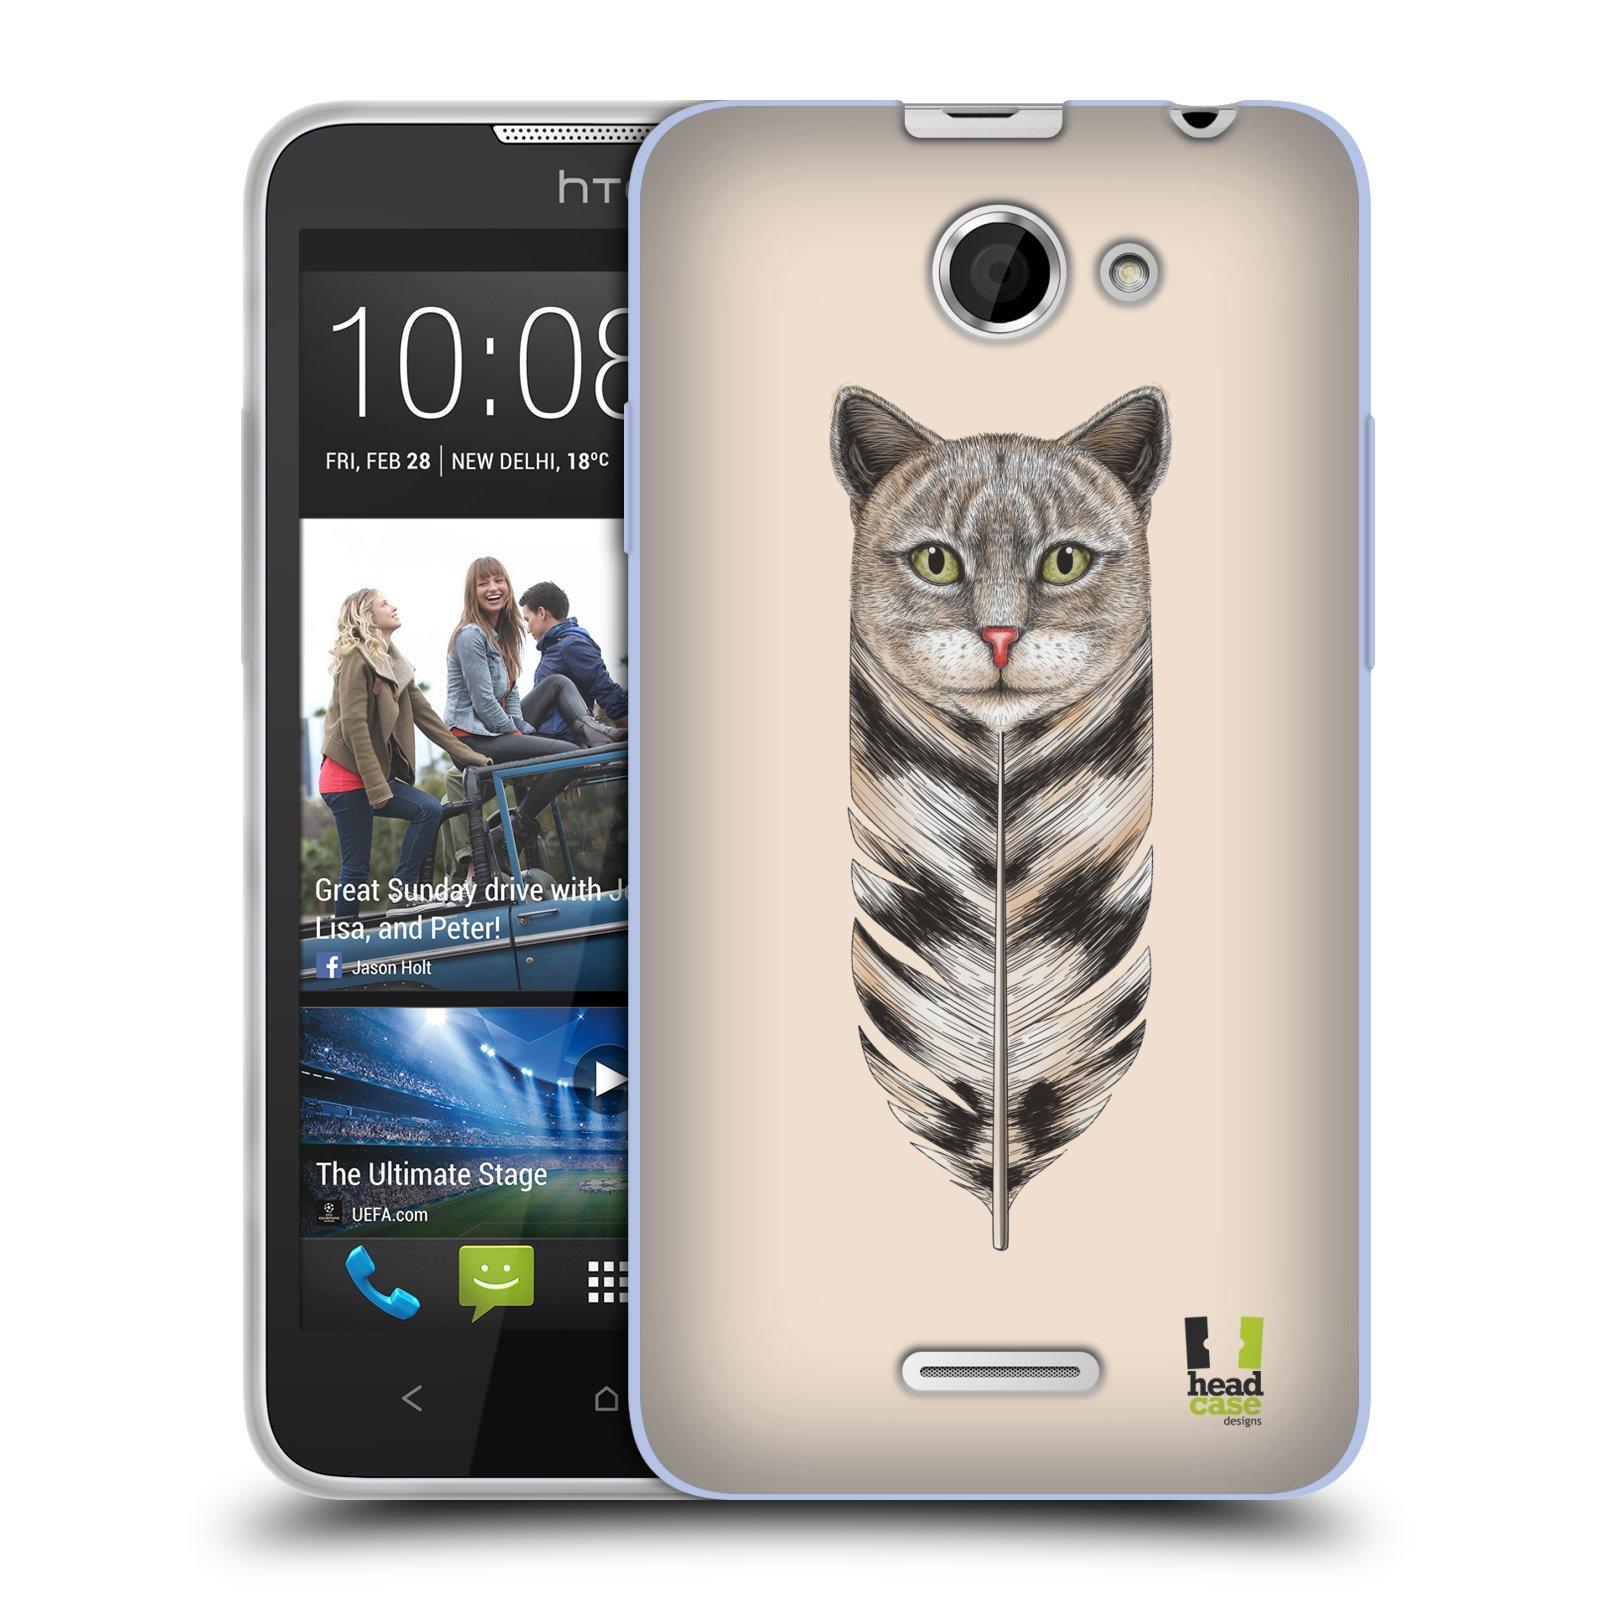 Silikonové pouzdro na mobil HTC Desire 516 HEAD CASE PÍRKO KOČKA (Silikonový kryt či obal na mobilní telefon HTC Desire 516 Dual SIM)